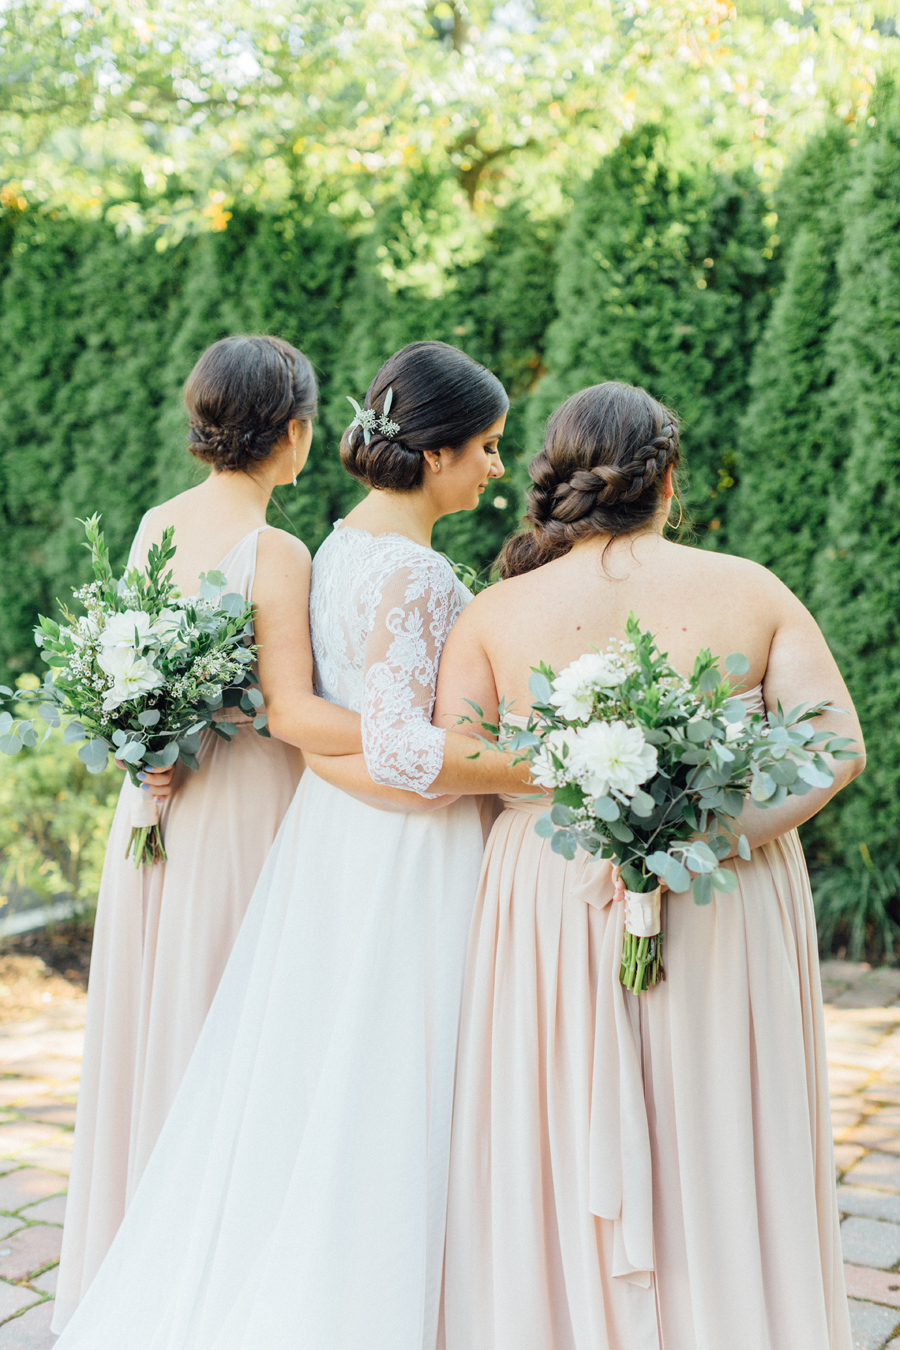 the-inn-at-leola-wedding-lancaster-pennsylvania-wedding-photographer-rebeka-viola-photograhy (33).jpg